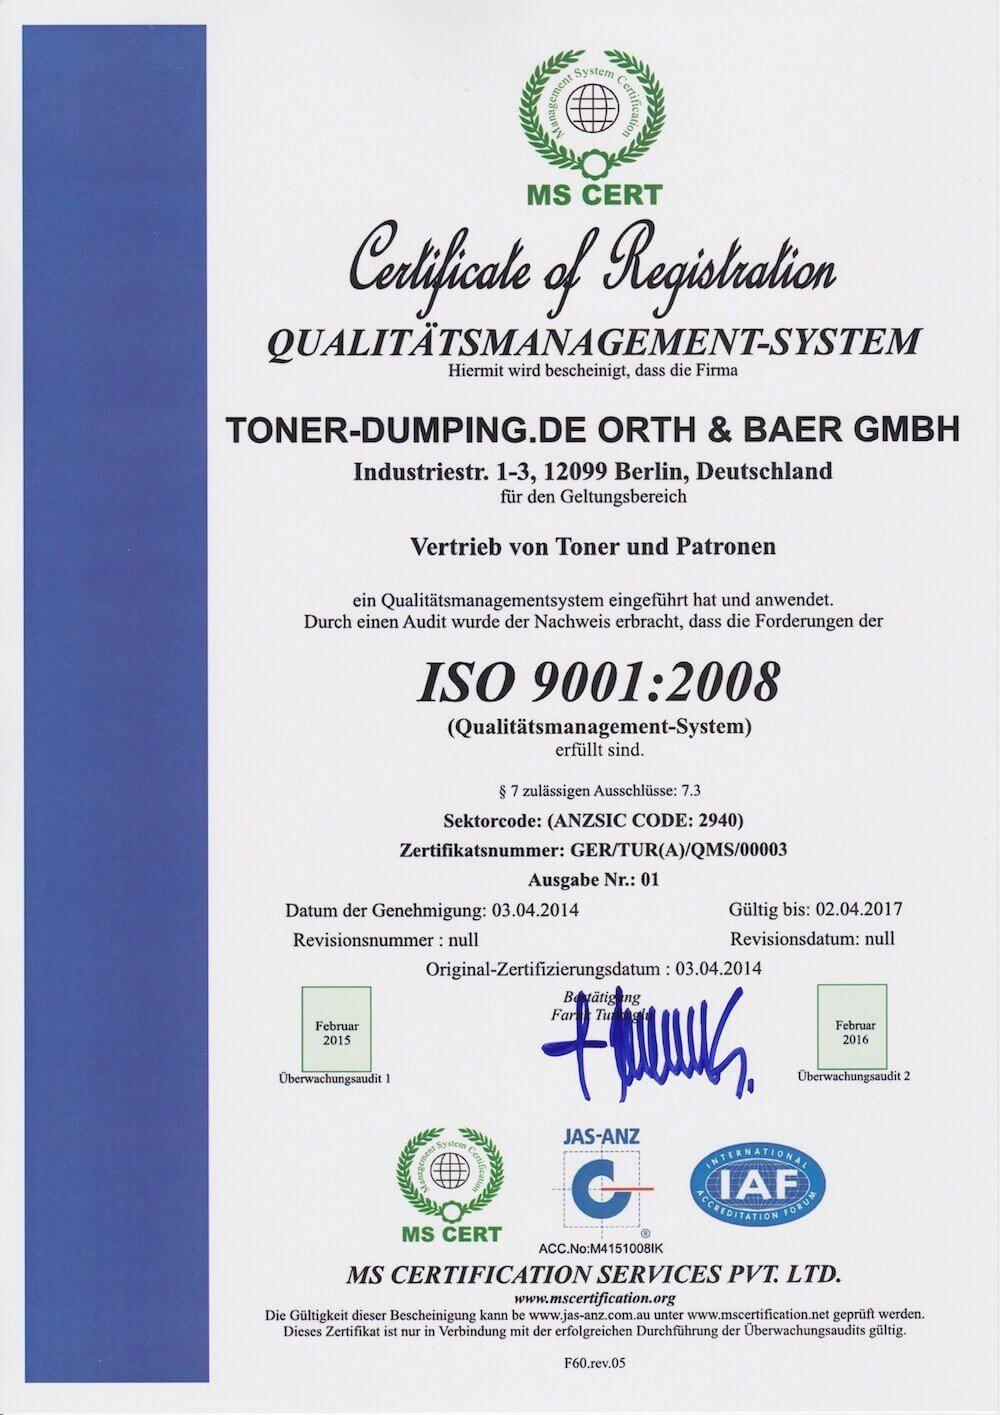 ISO 9001:2008 Zertifikatsnummer: GER/TUR(A)/QMS/00003